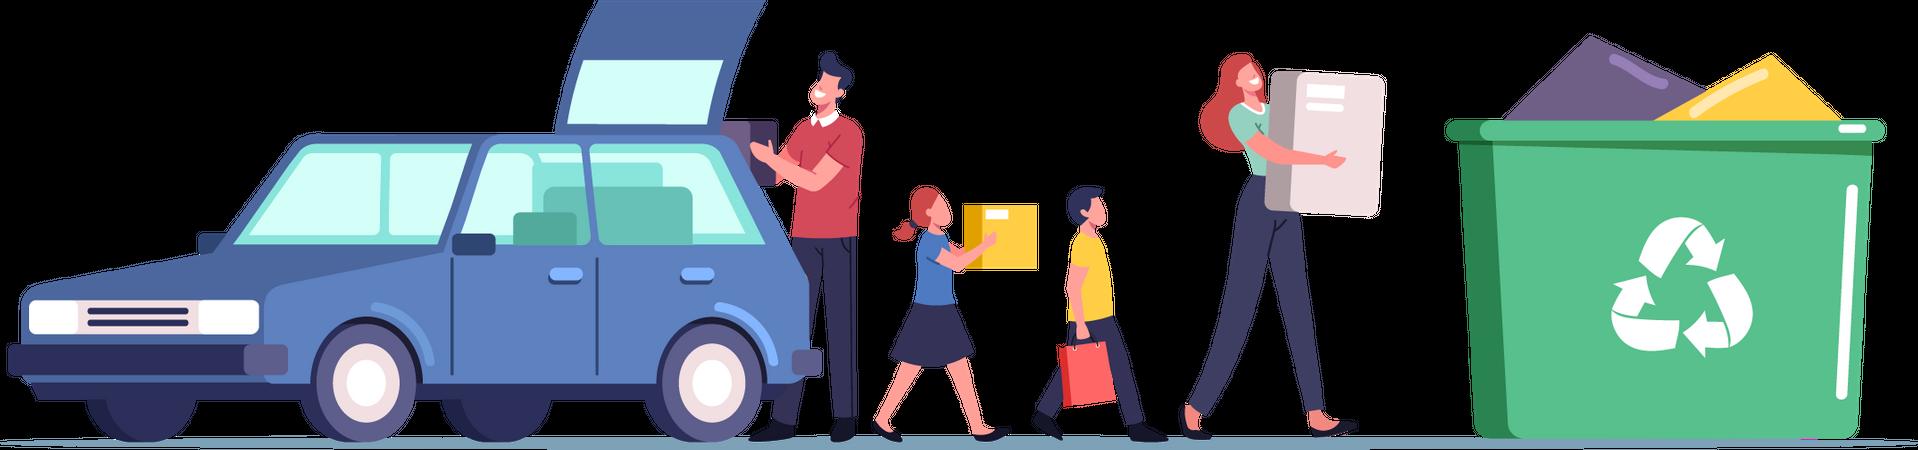 Family with Children Loading Goods from Car to Litter Bin Illustration